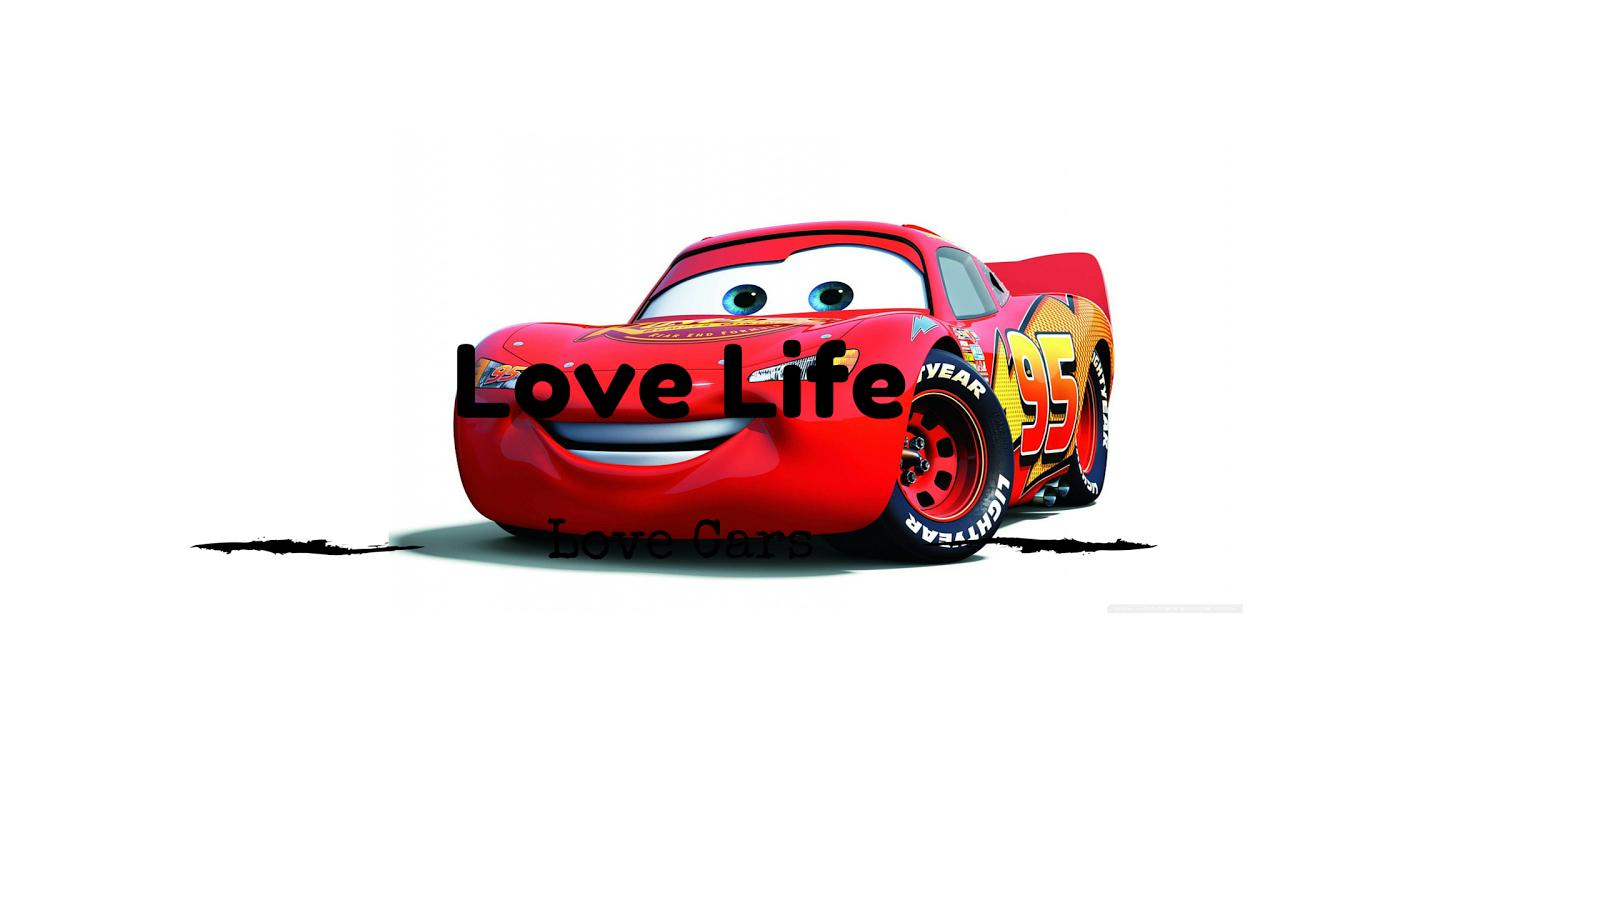 LOVE LIFE LOVE CARS